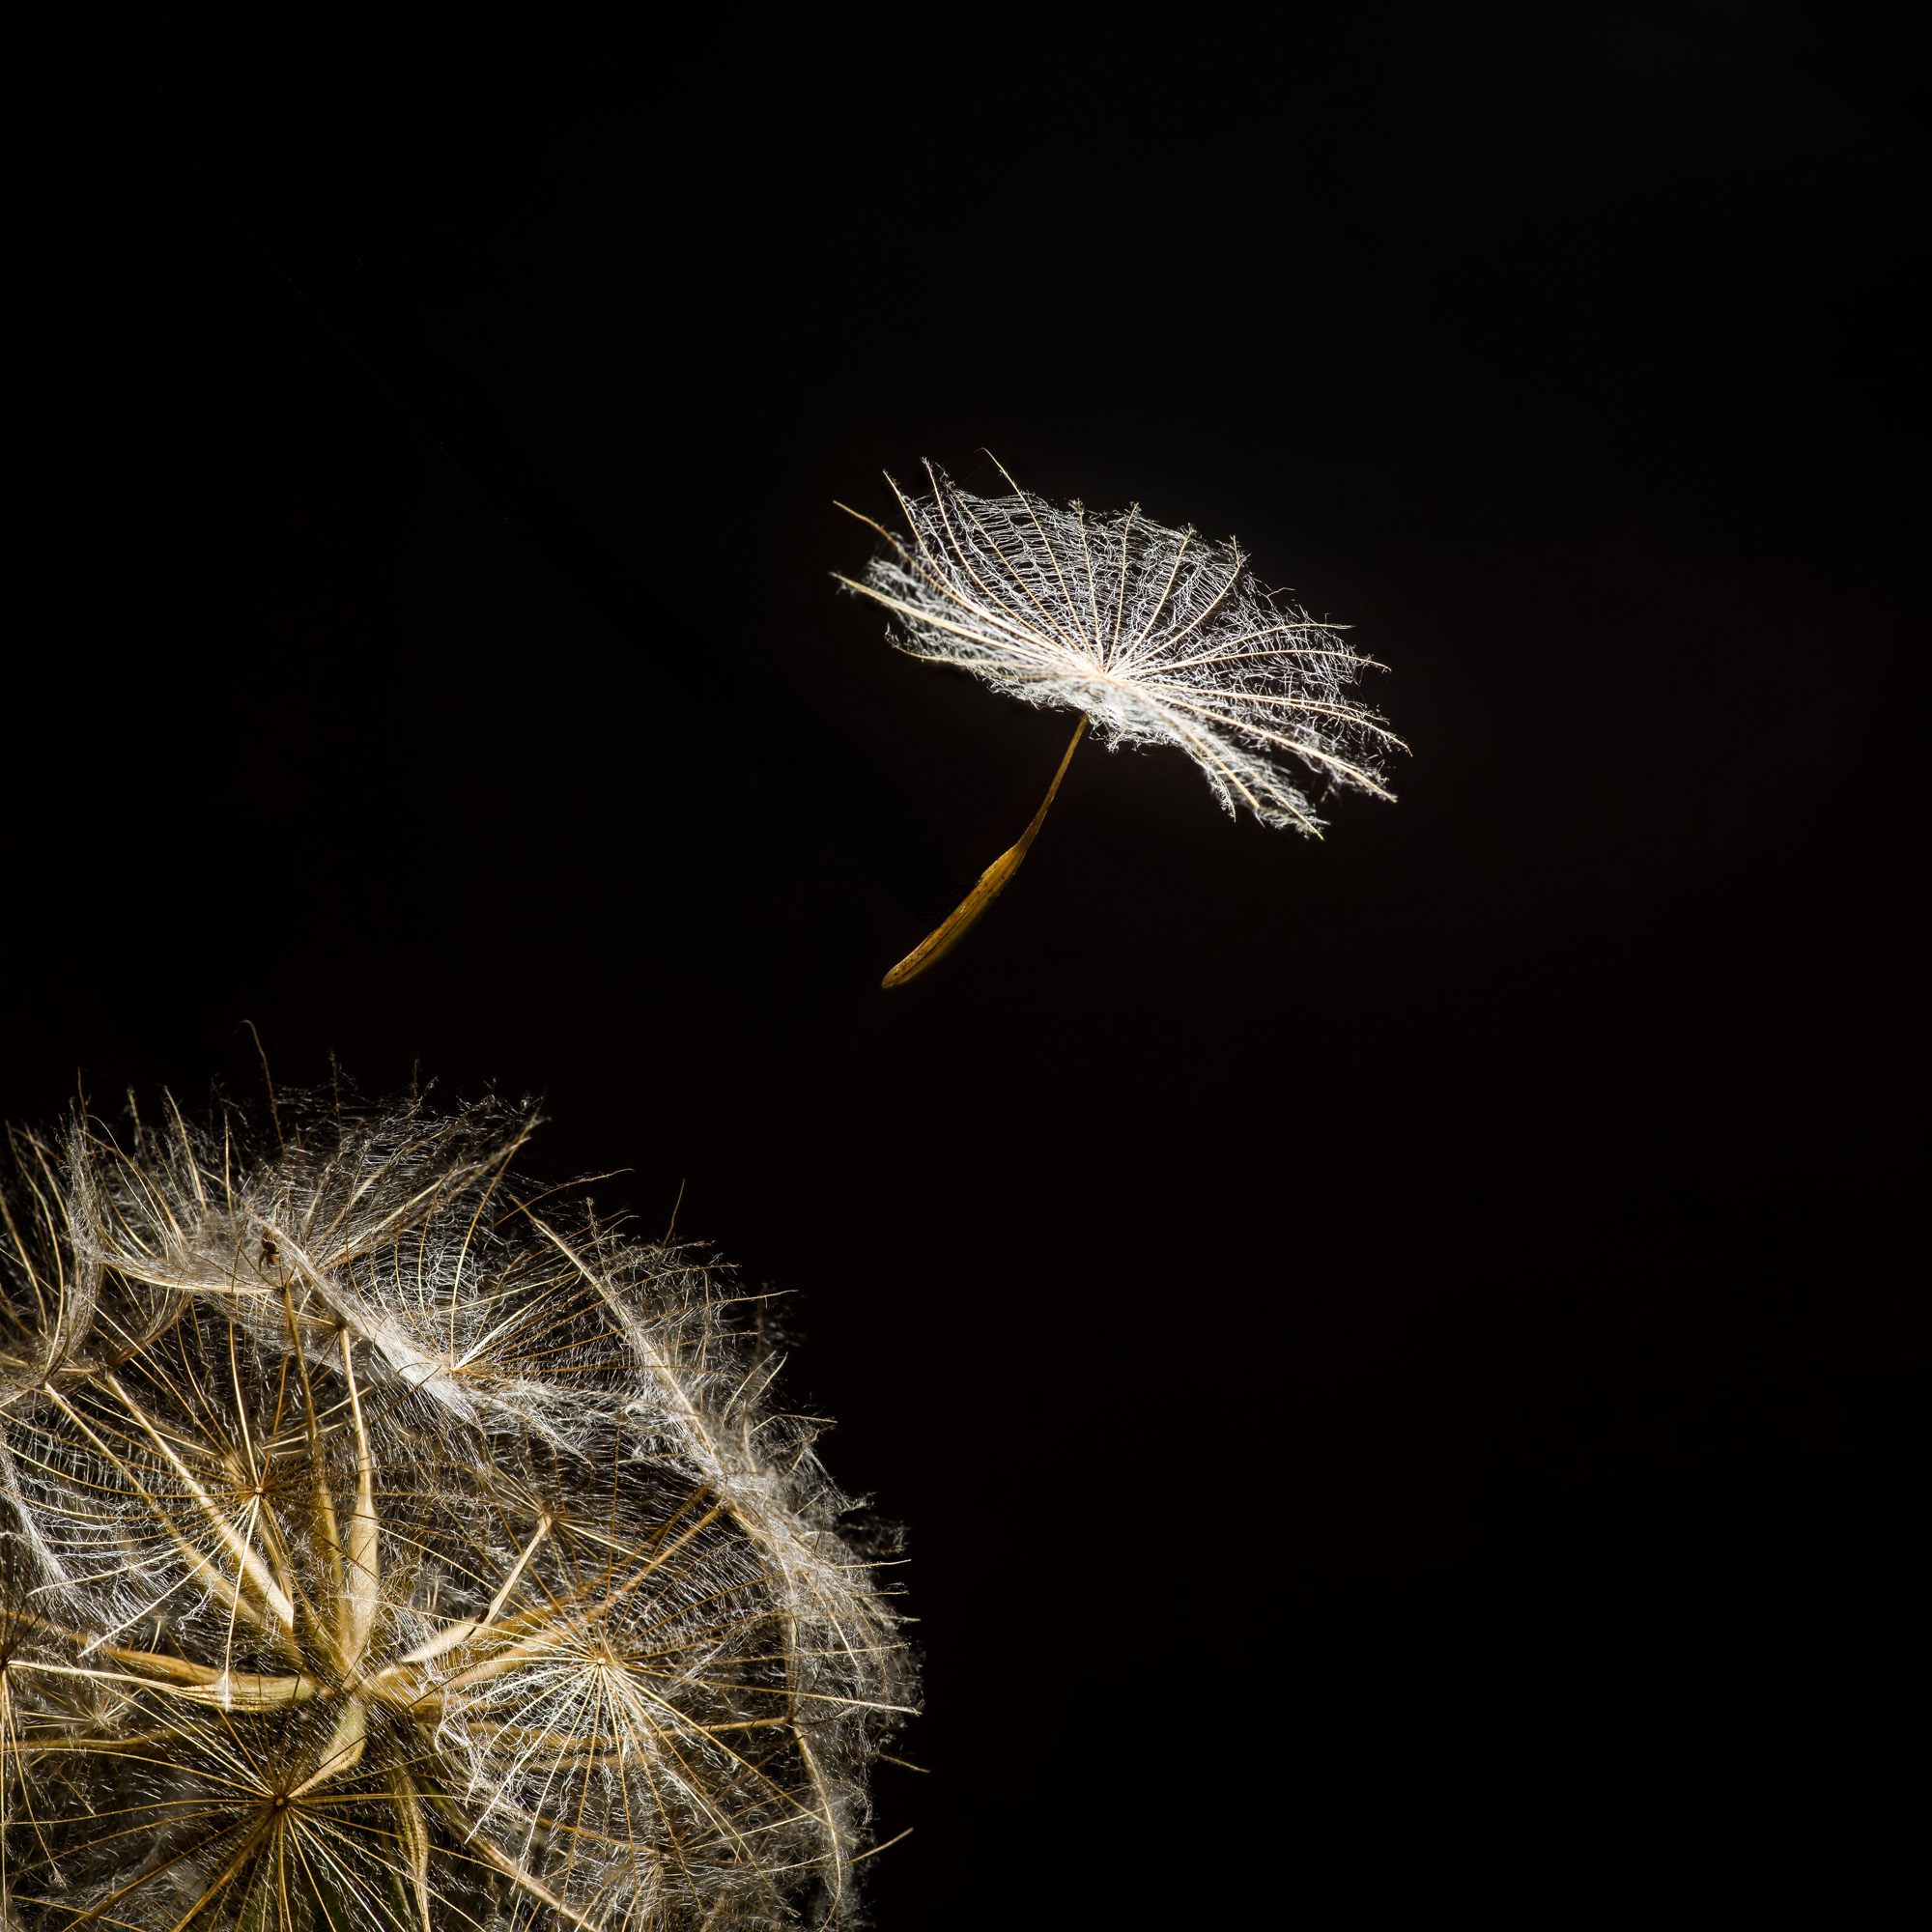 seed of Salsify-Tragopogon pratensis